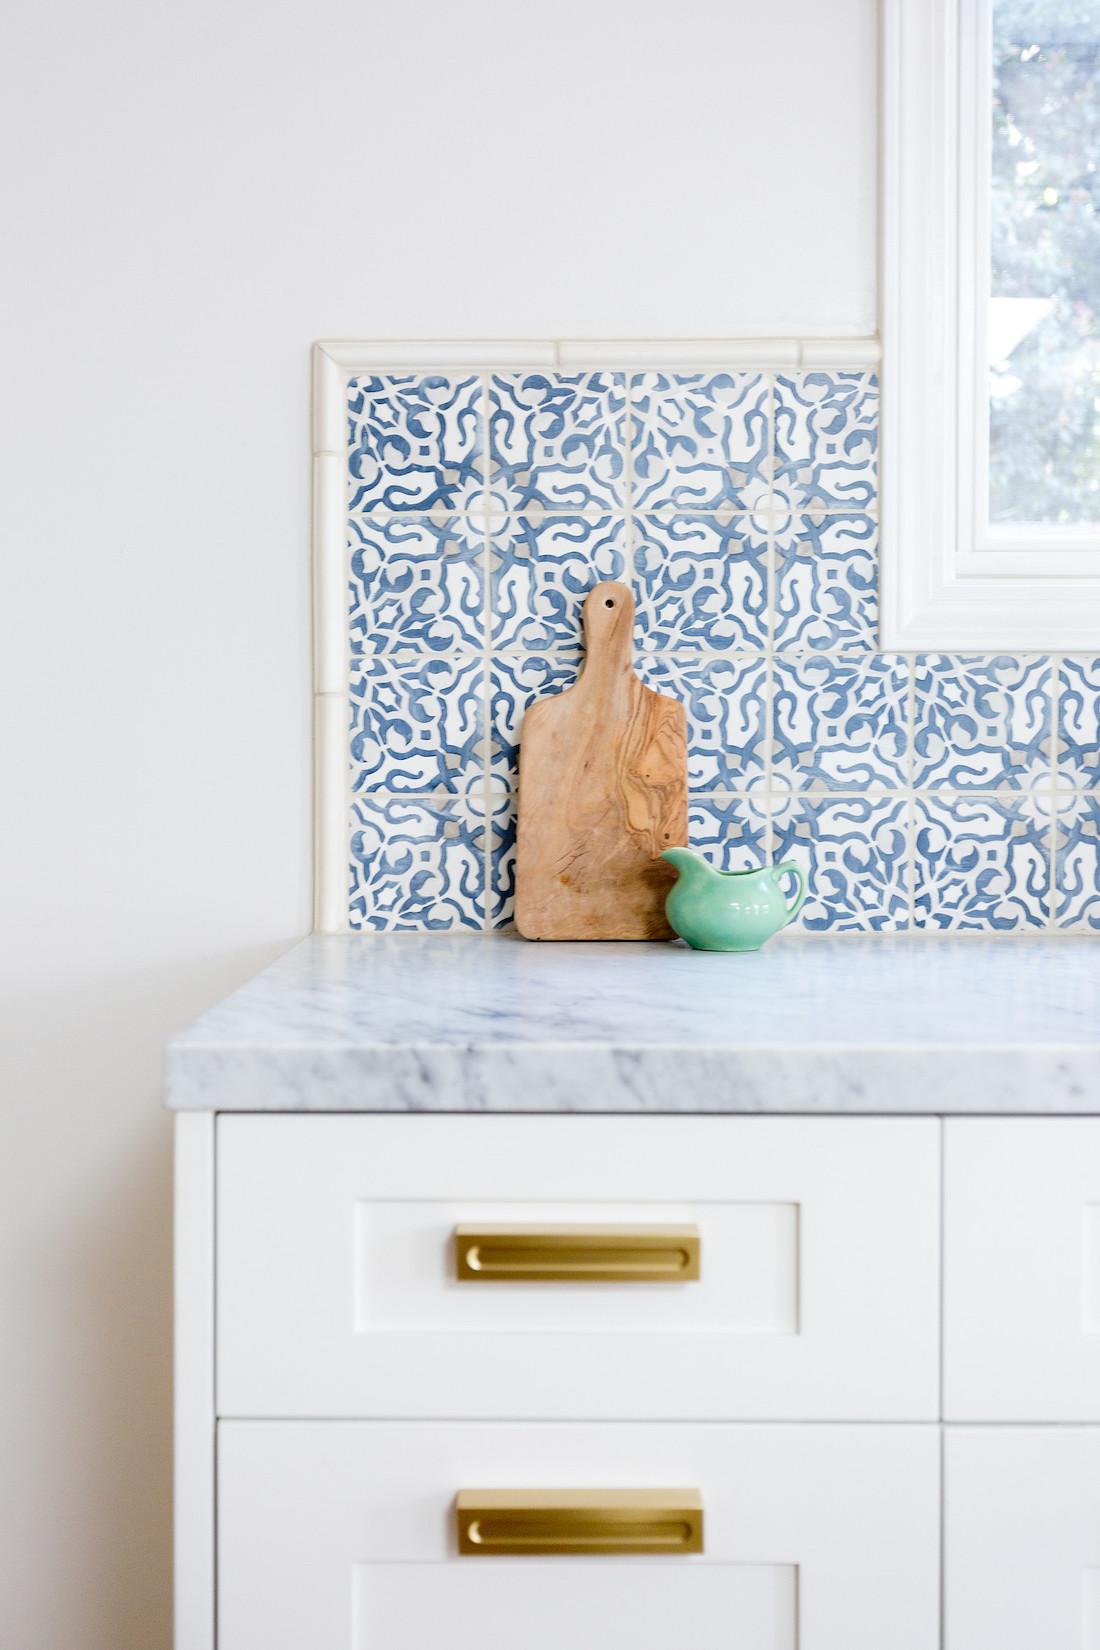 Finishing details around blue tile